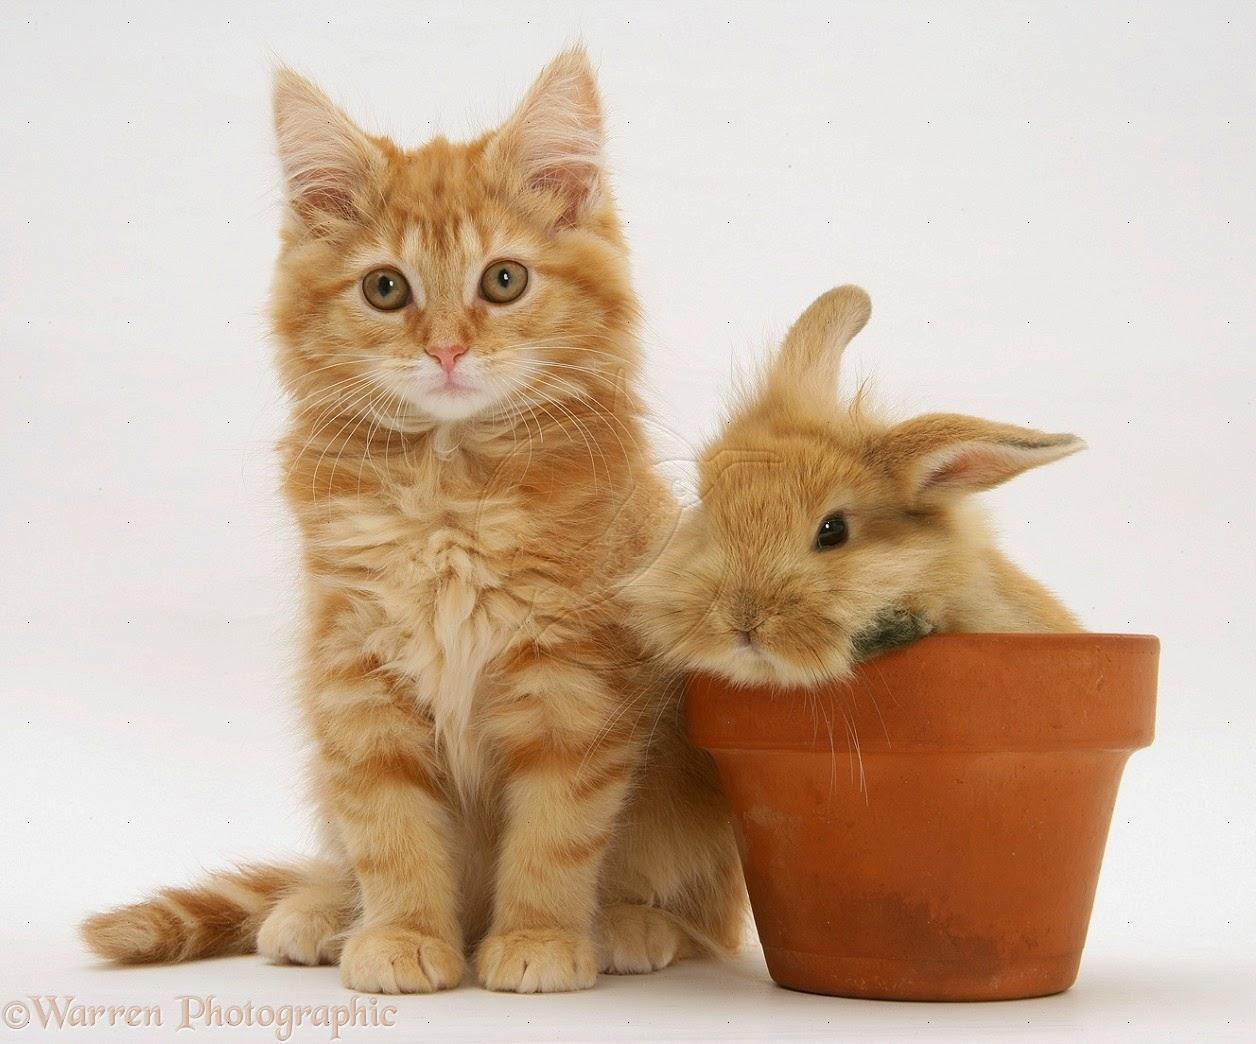 Download 93+  Gambar Kucing Anggora Paling Lucu Paling Keren